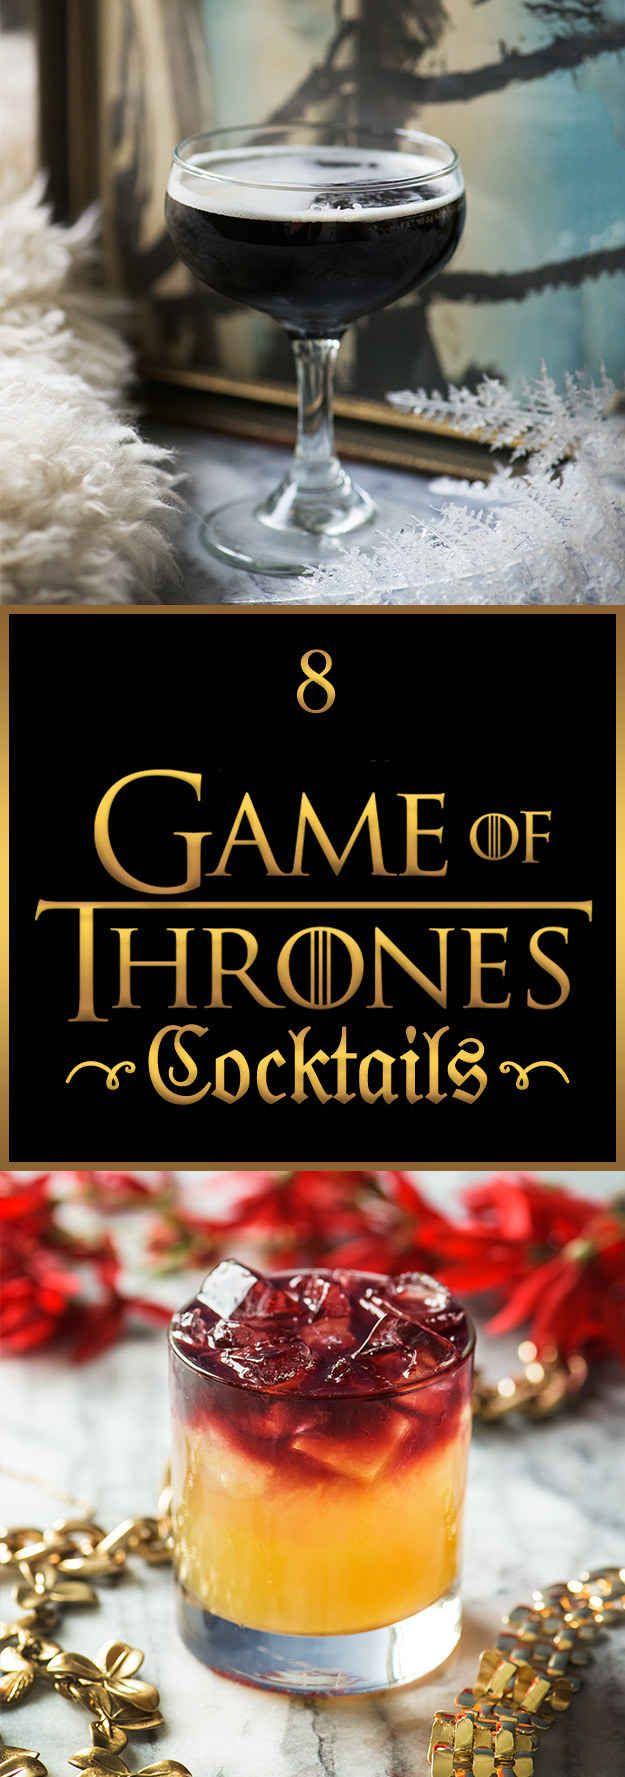 Permalink to Game Of Thrones Kuchen